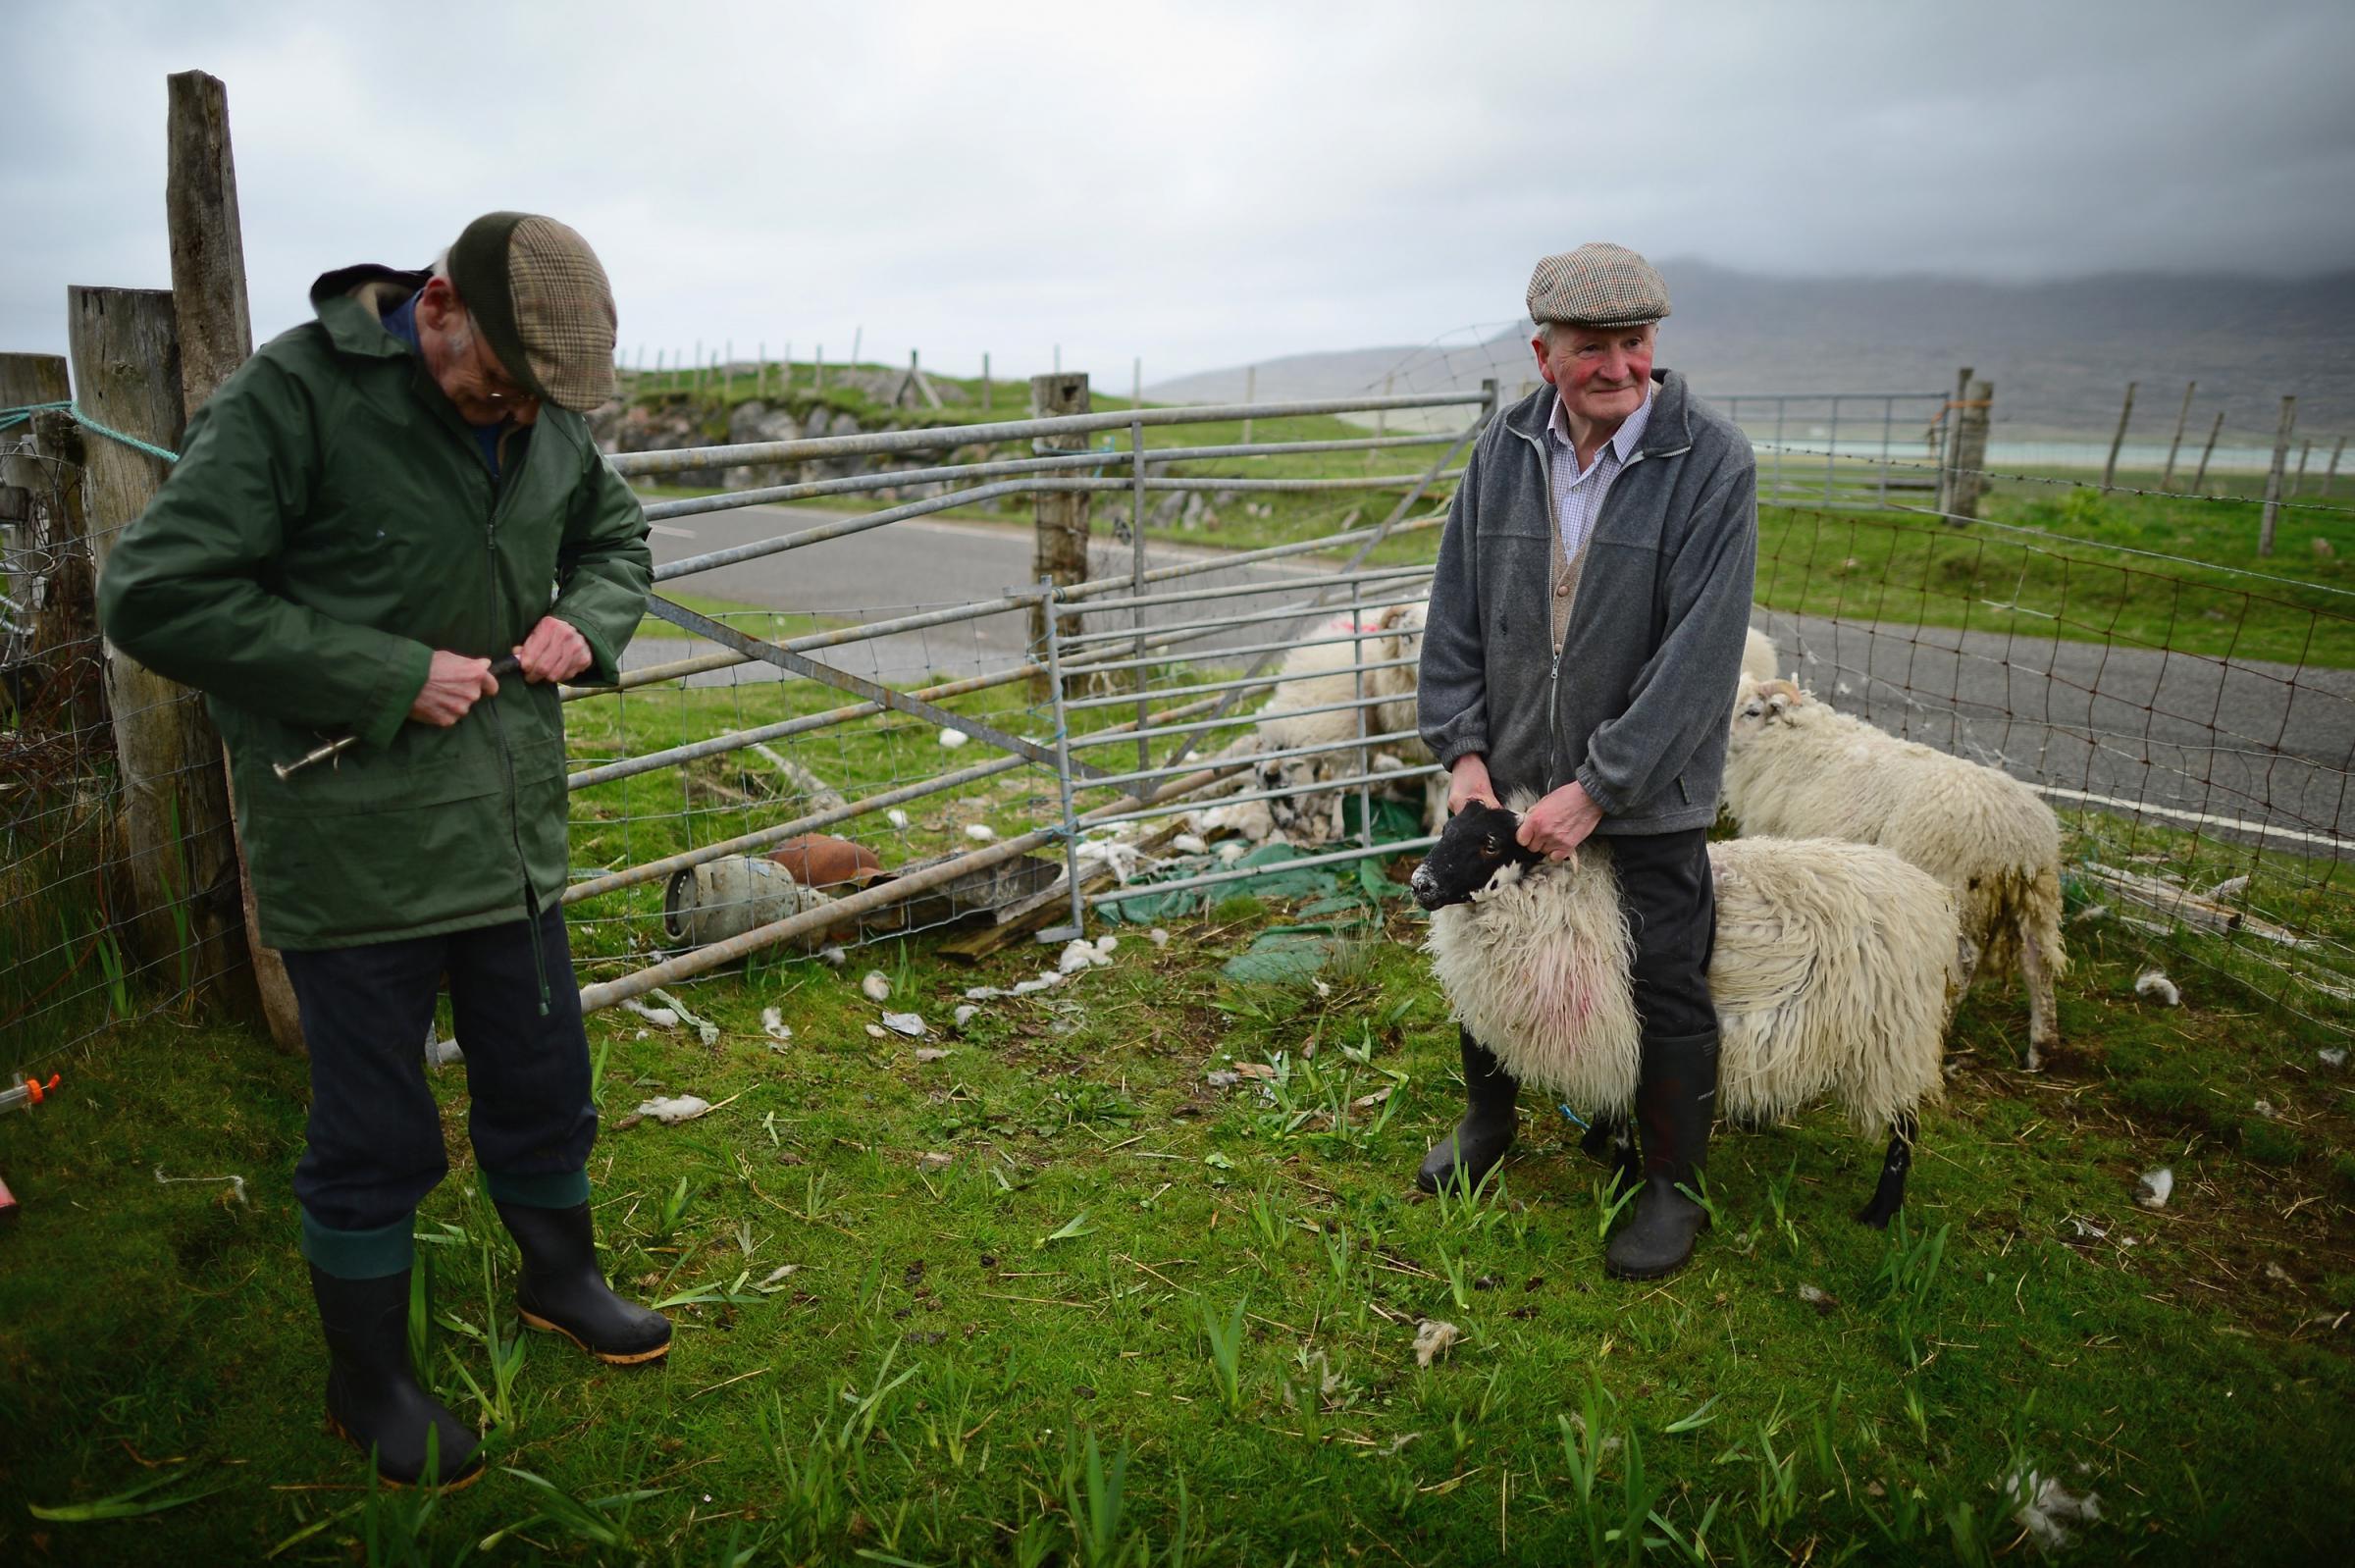 Farmers dating site scotland